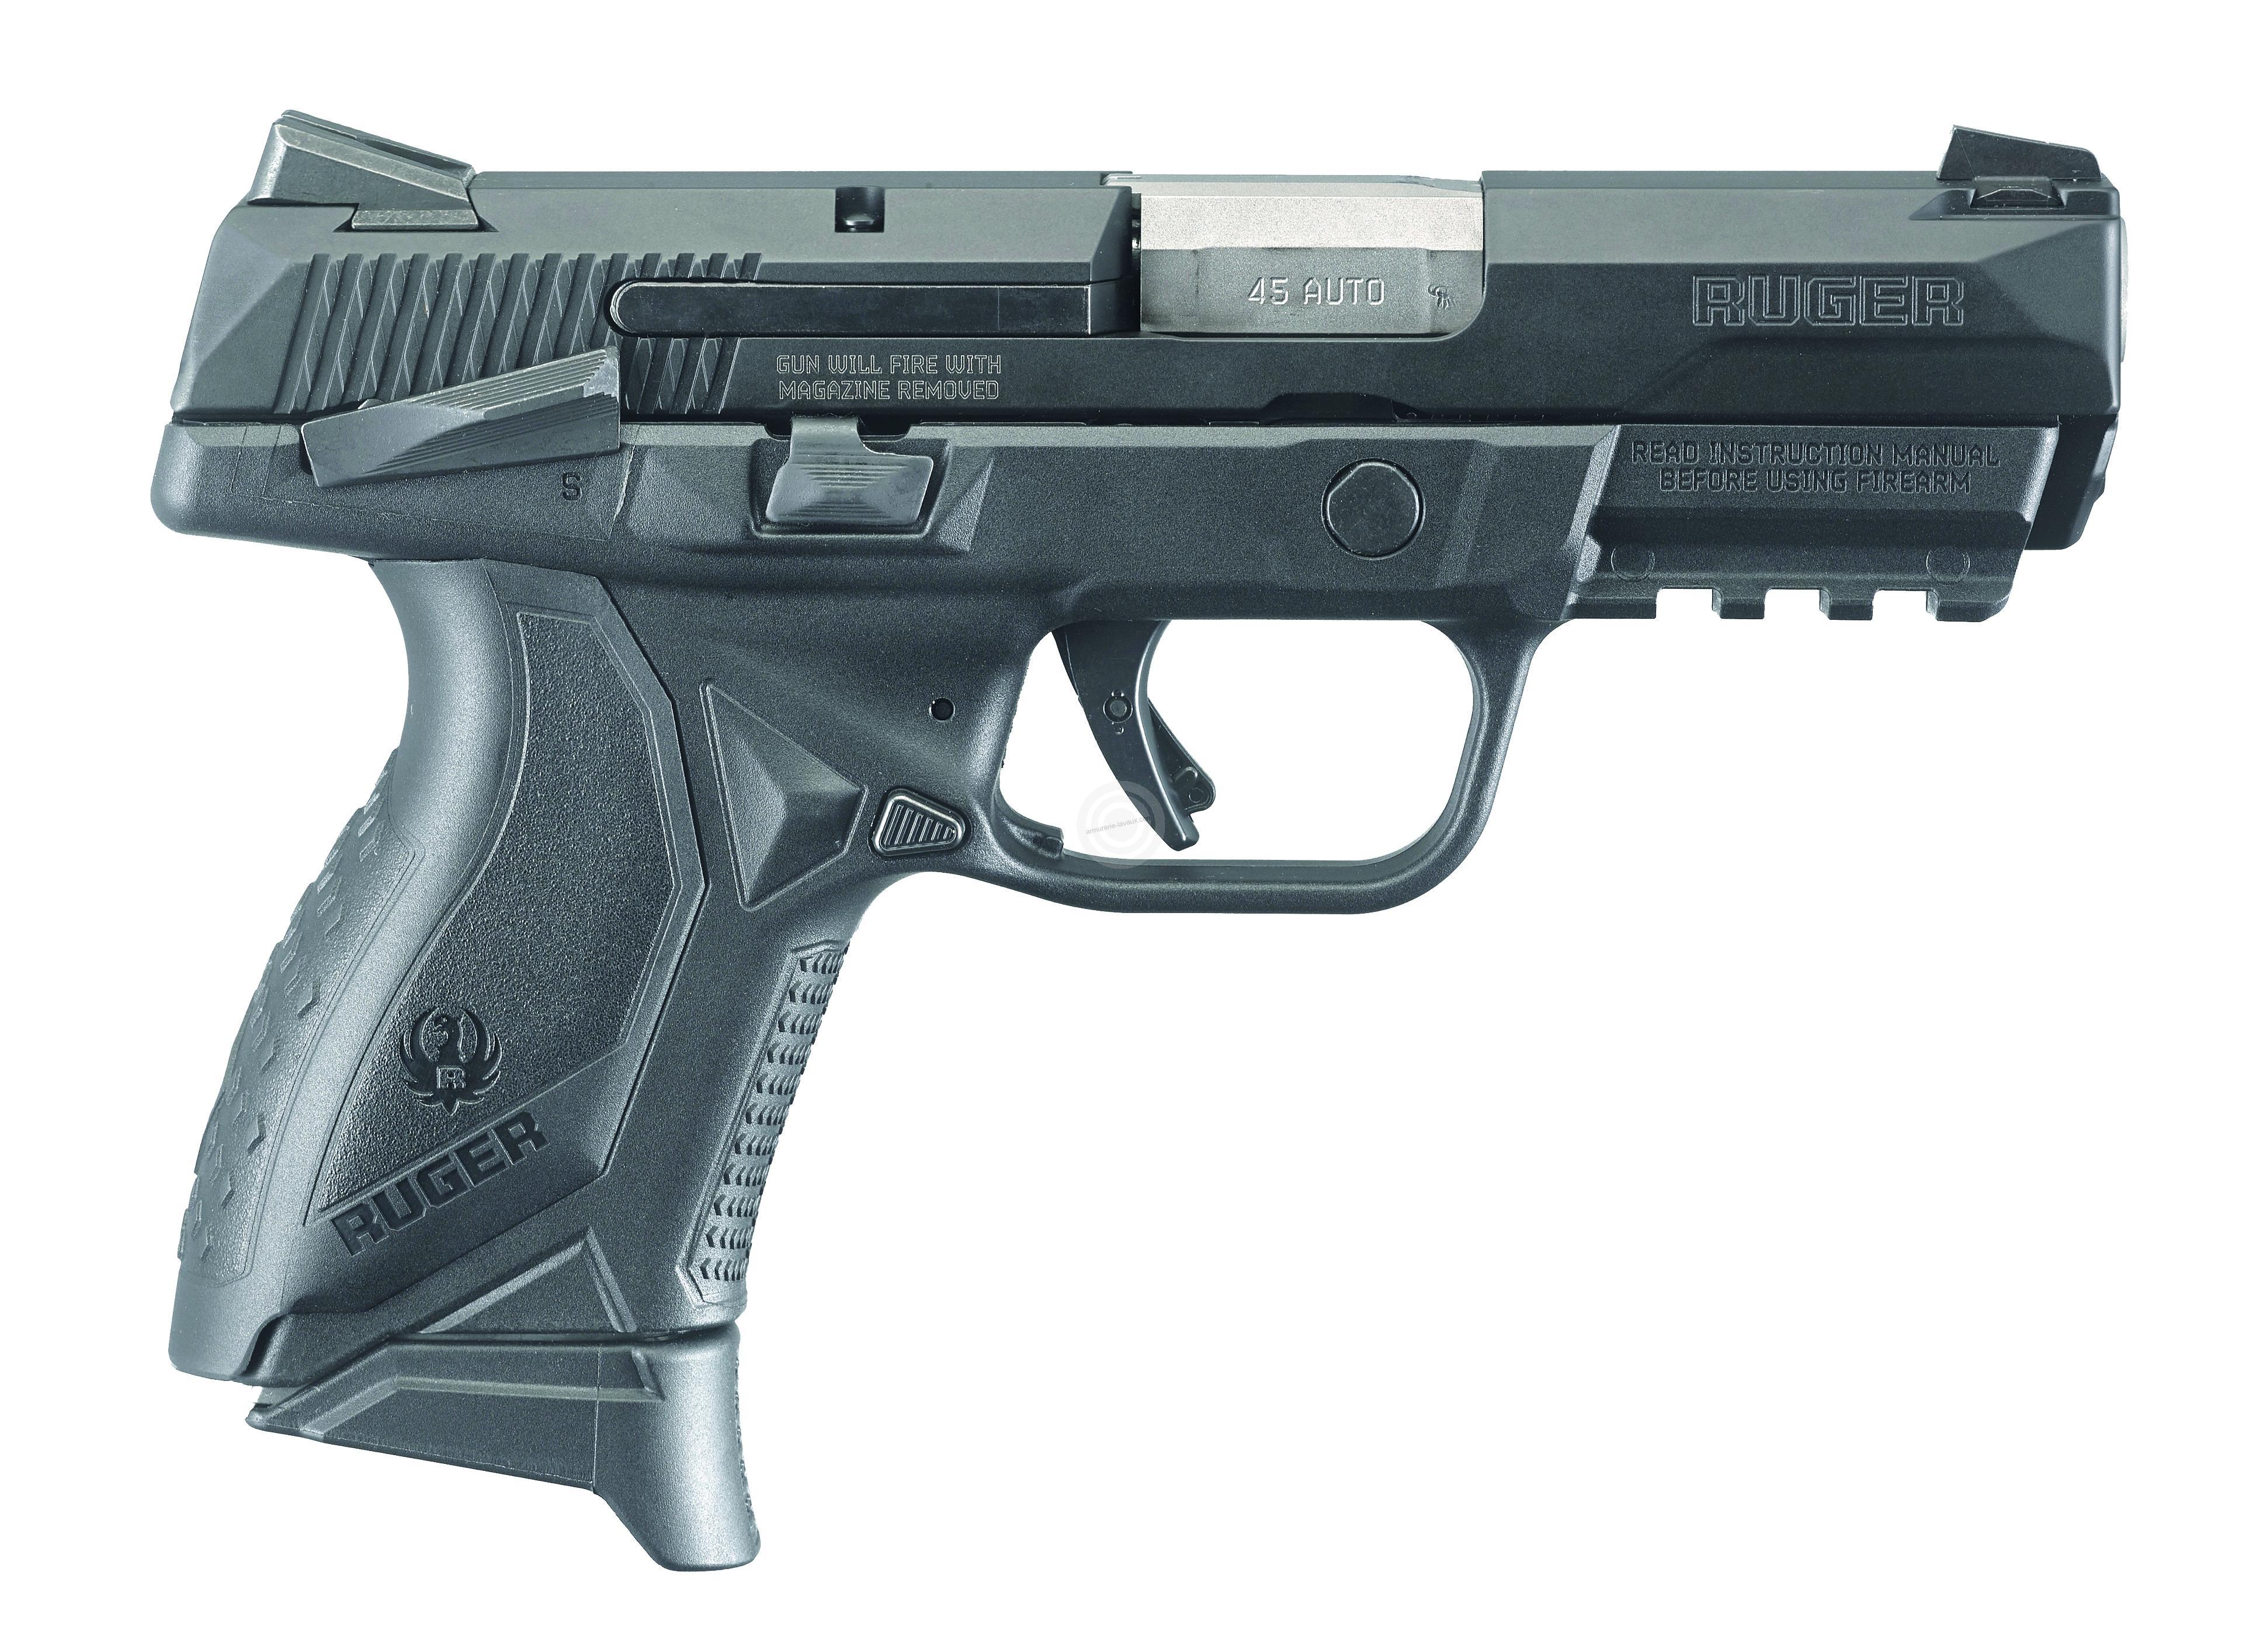 Pistolet RUGER AMERICAN PISTOL COMPACT calibre 9x19